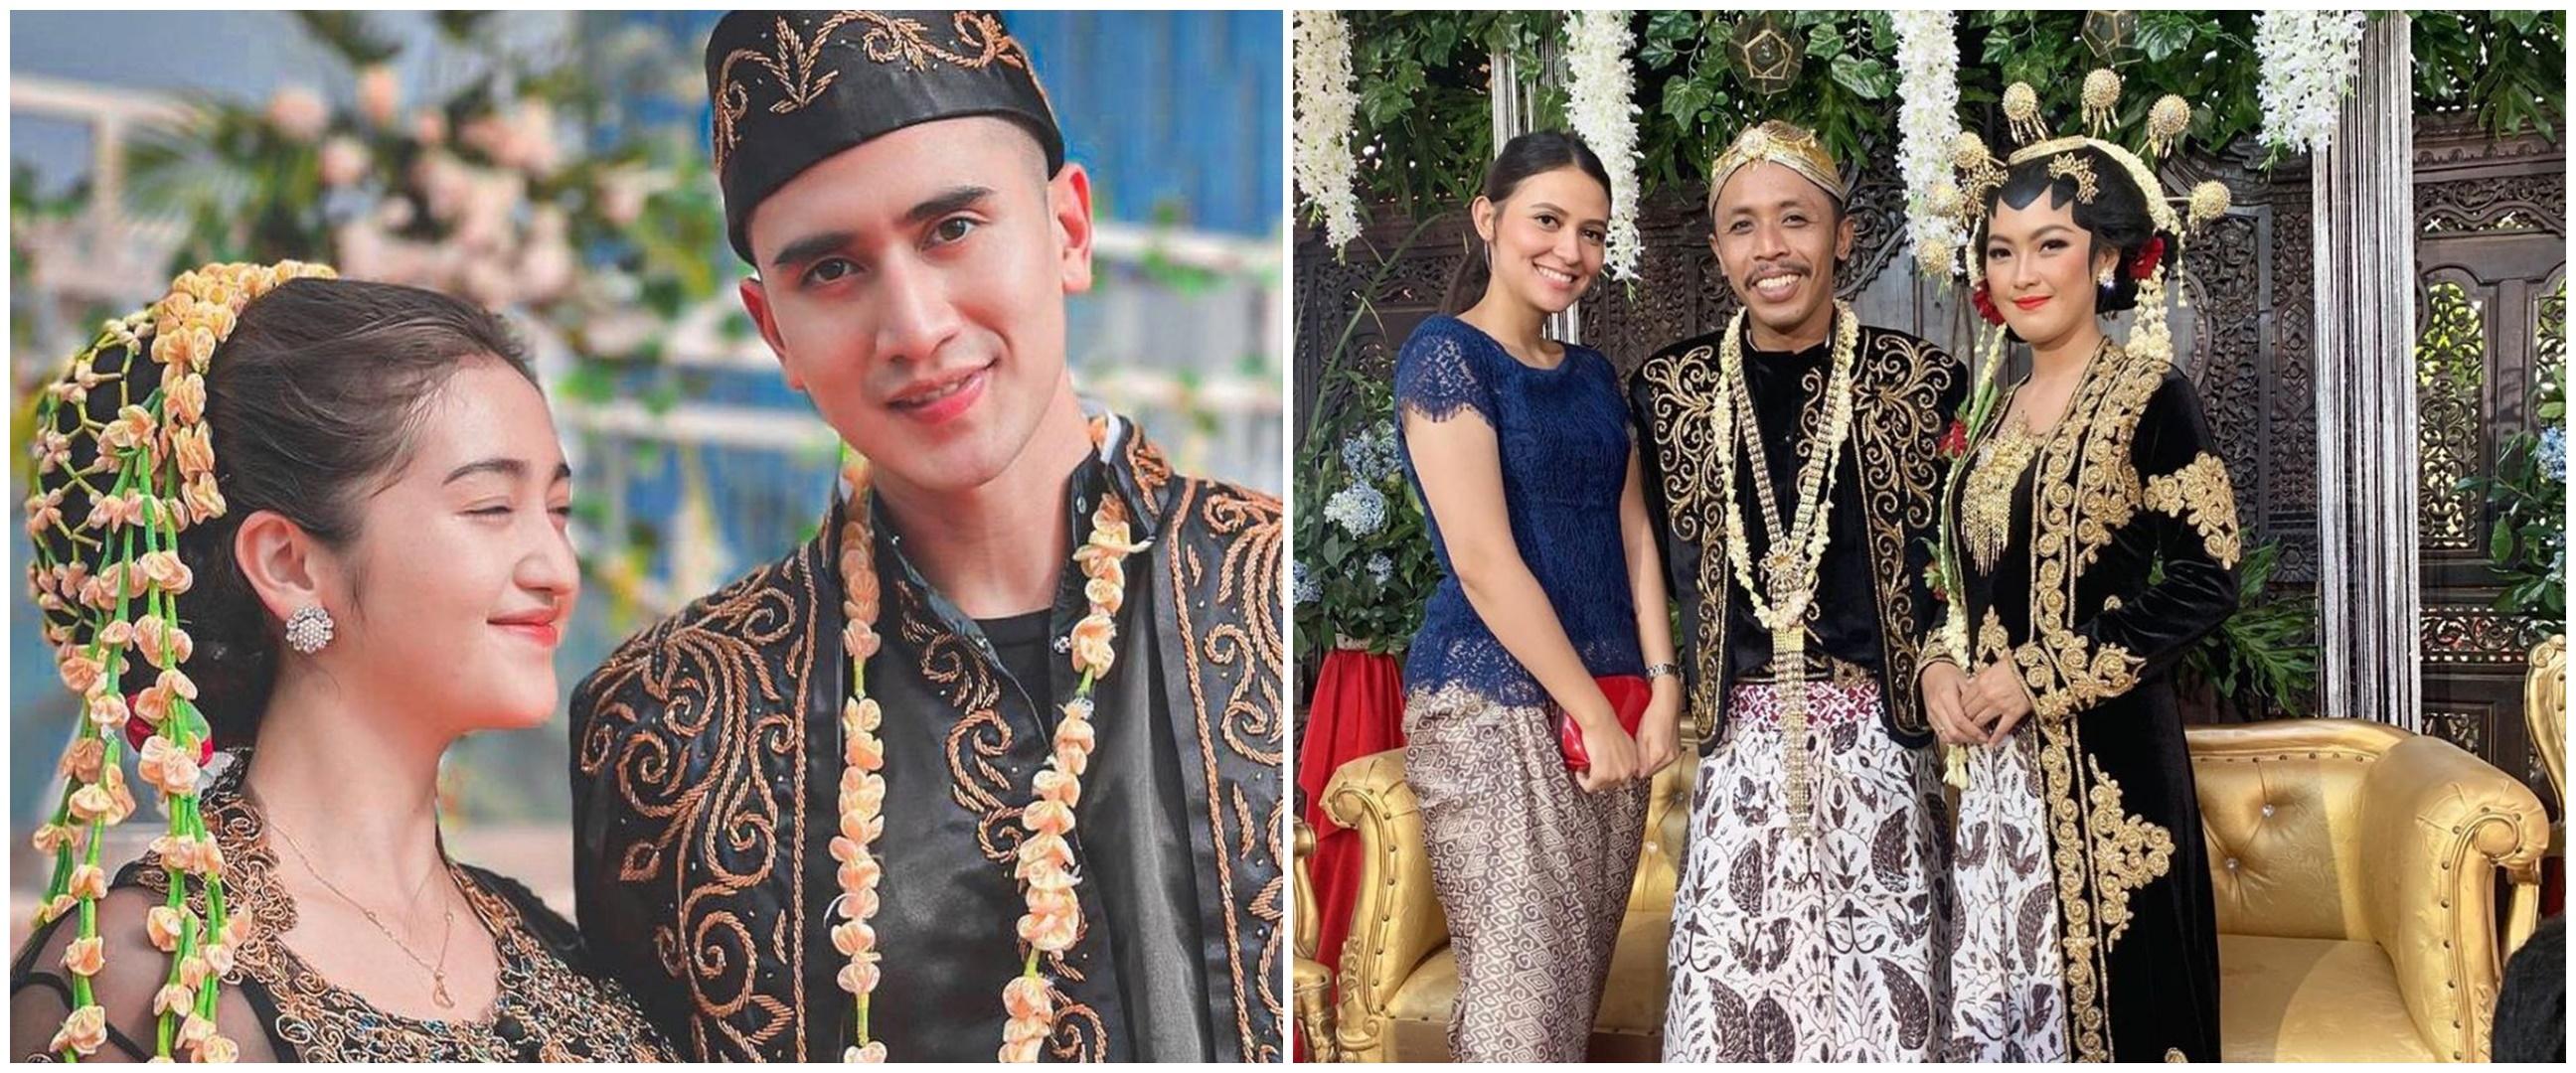 Pakai adat Jawa, intip potret pernikahan 6 pasangan seleb di sinetron